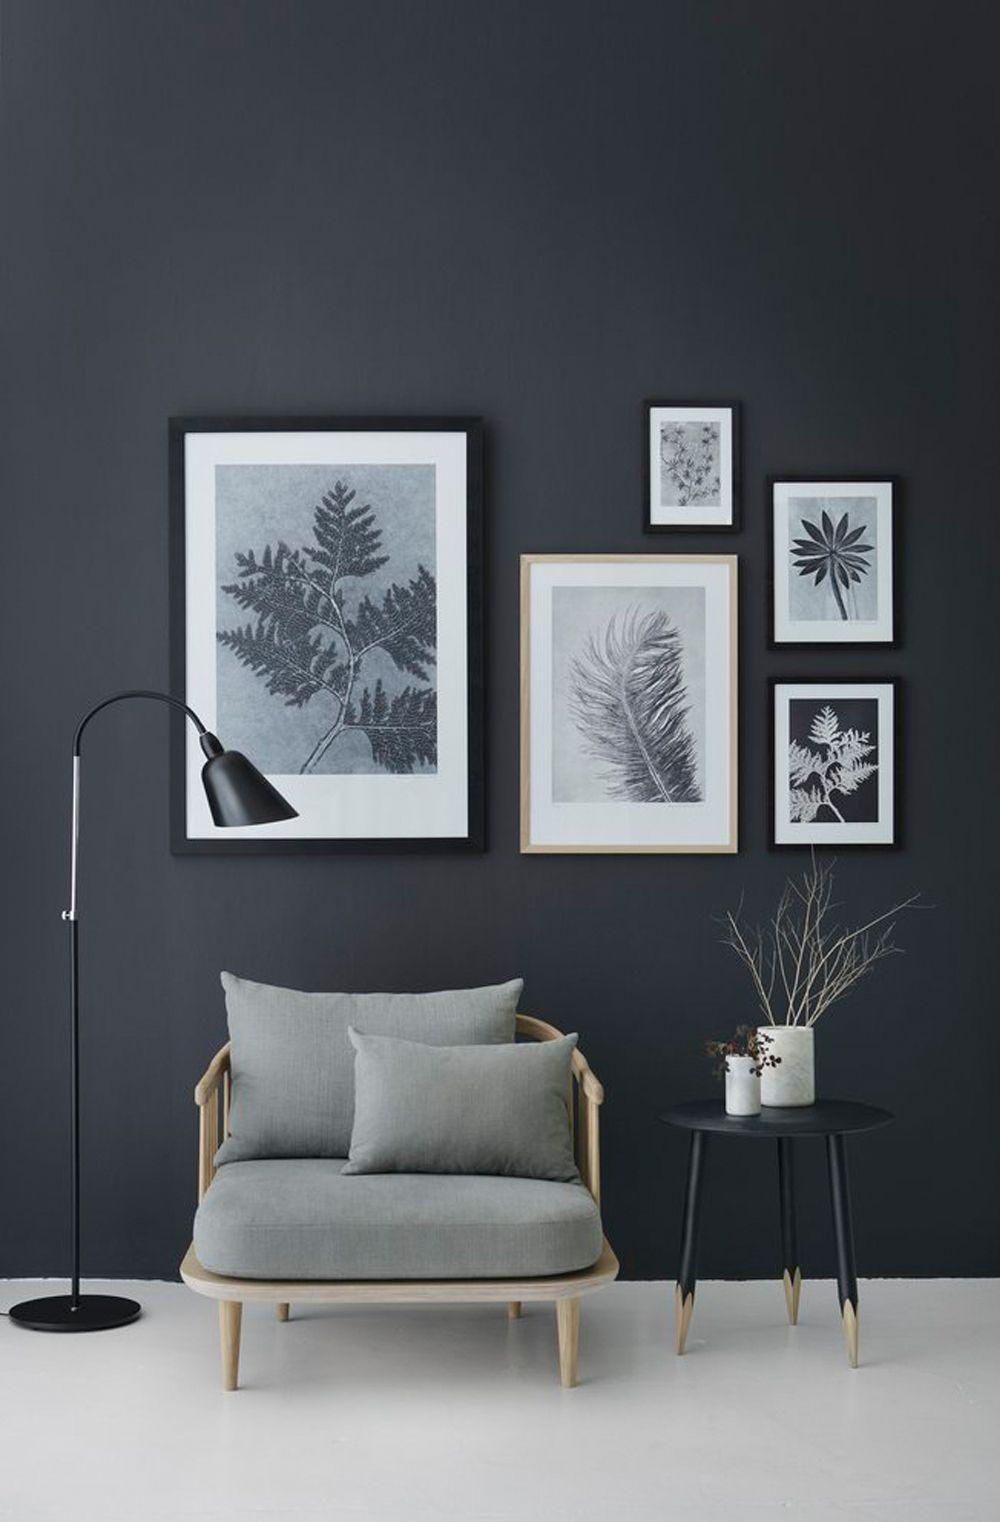 bring nature inside | Beautiful details | Pinterest | Drawers ...